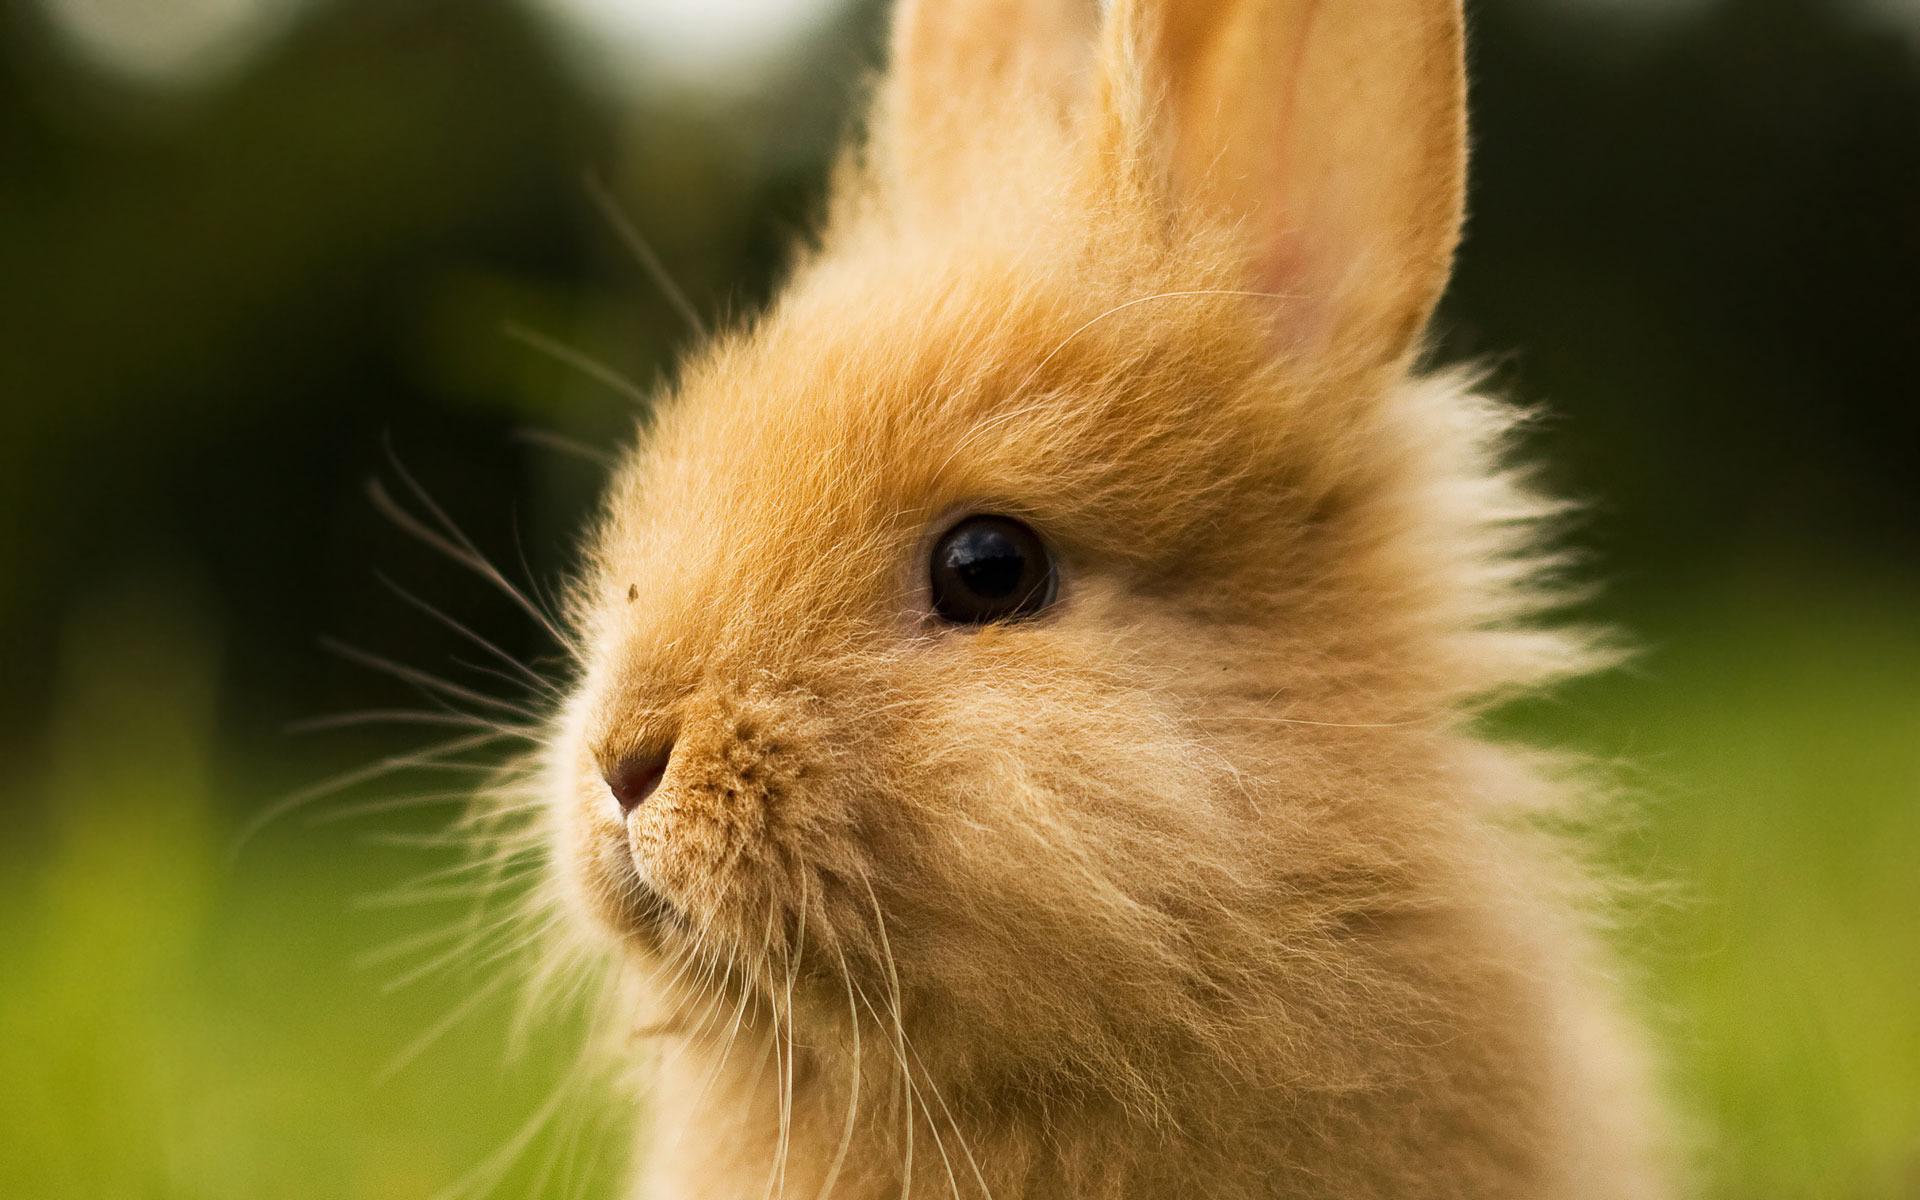 Cute bunny head